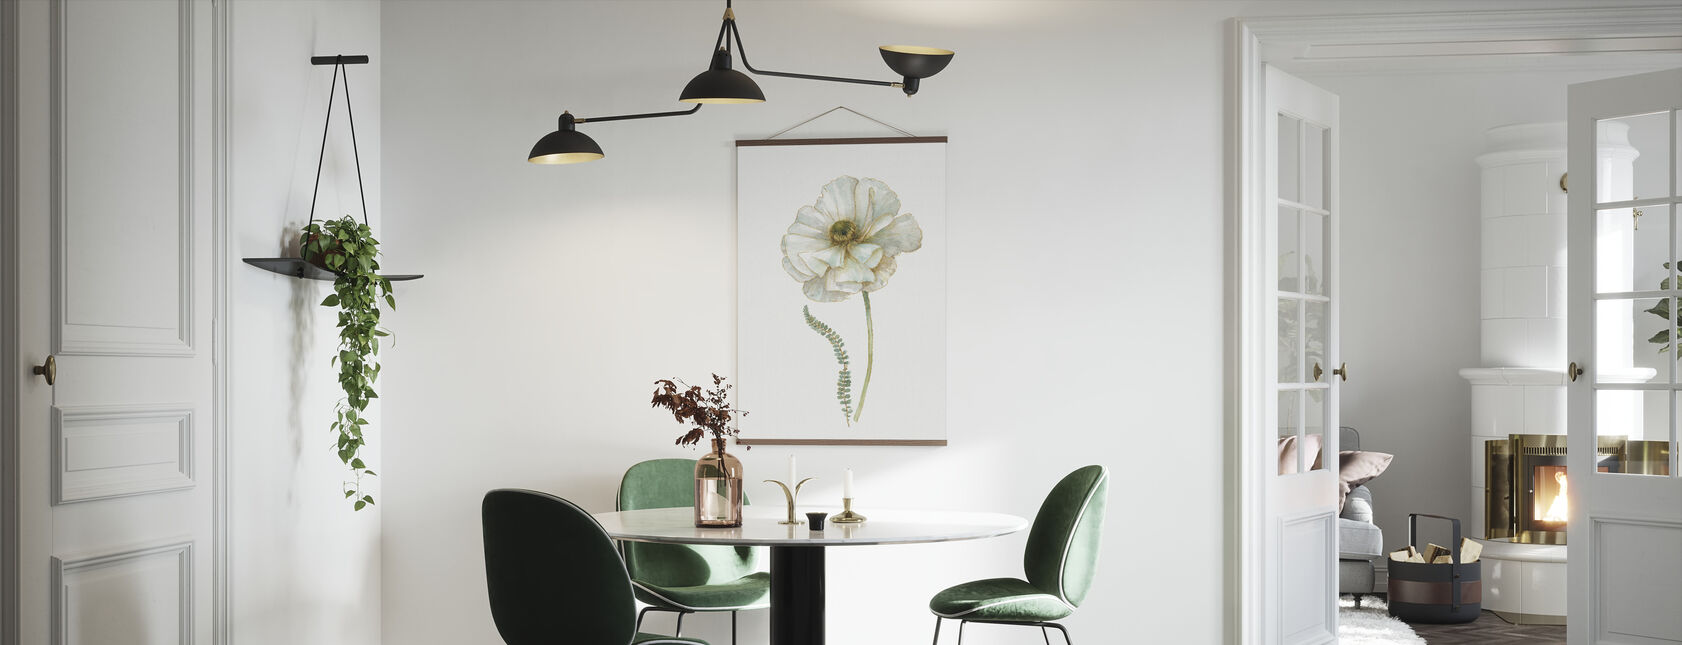 My Greenhouse Single Poppy II - Poster - Kitchen